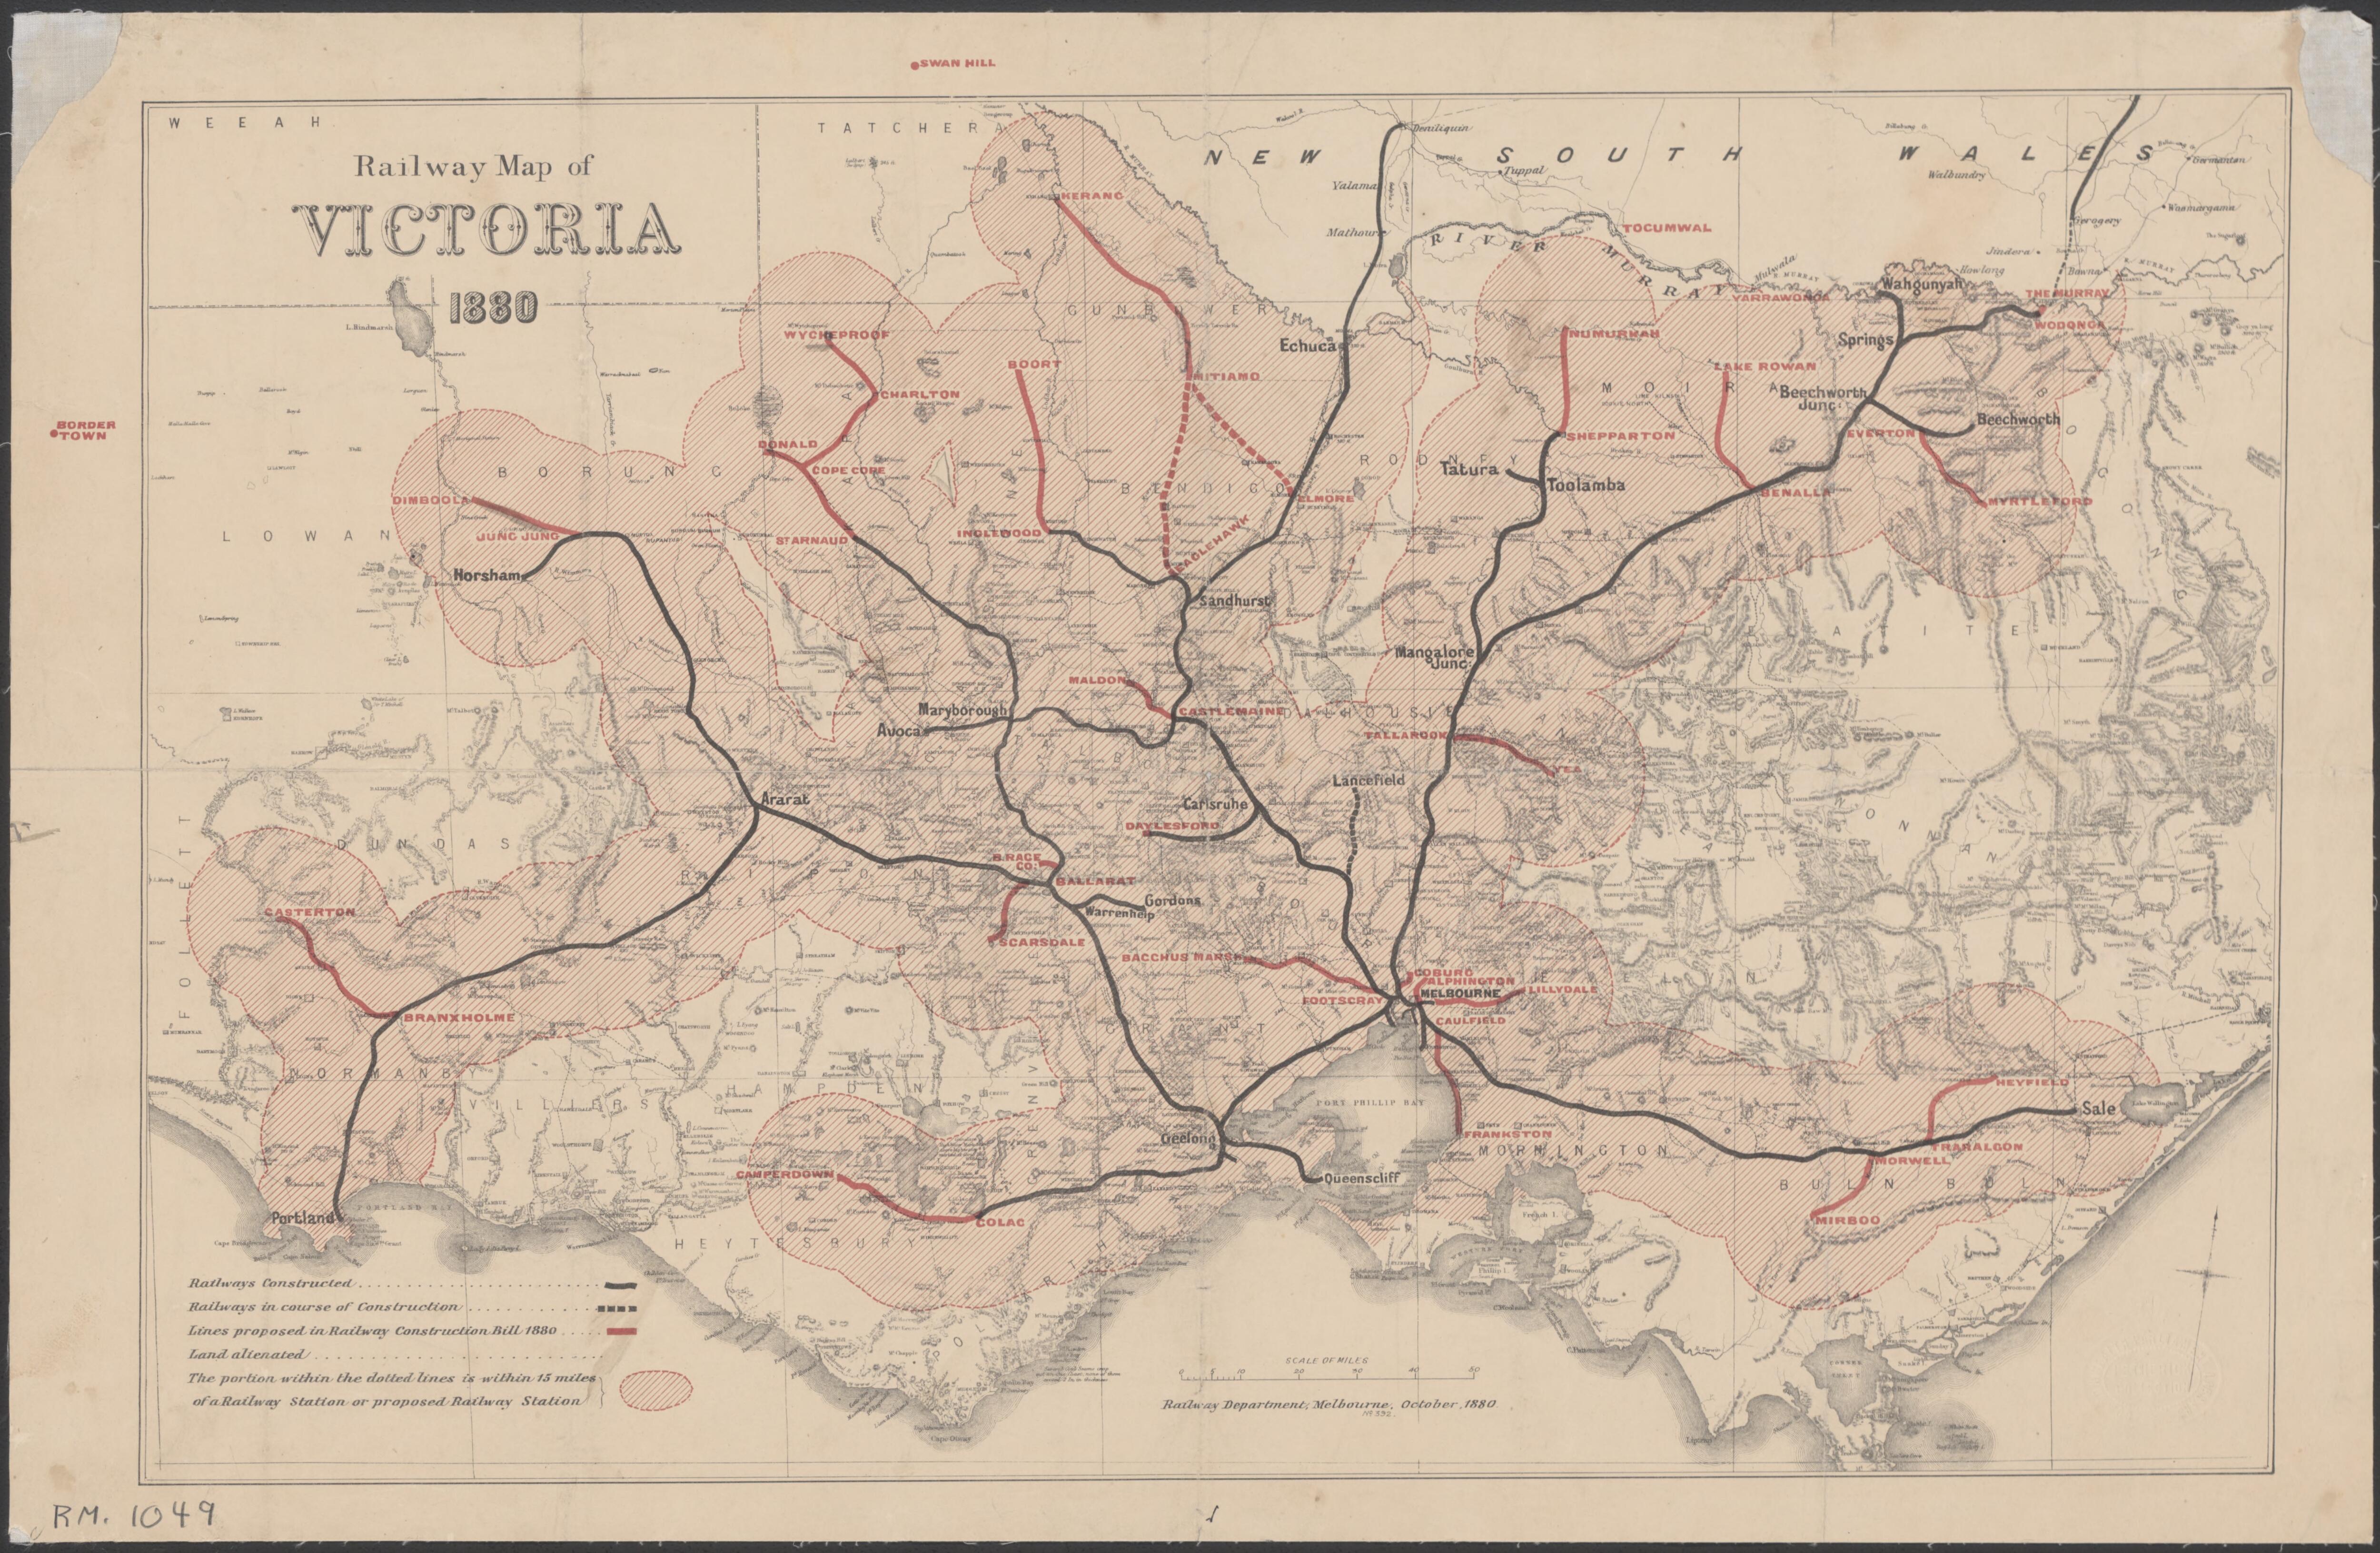 Evolution Of Rail Maps In Victoria Maps By Philip Mallis - Victorian world map